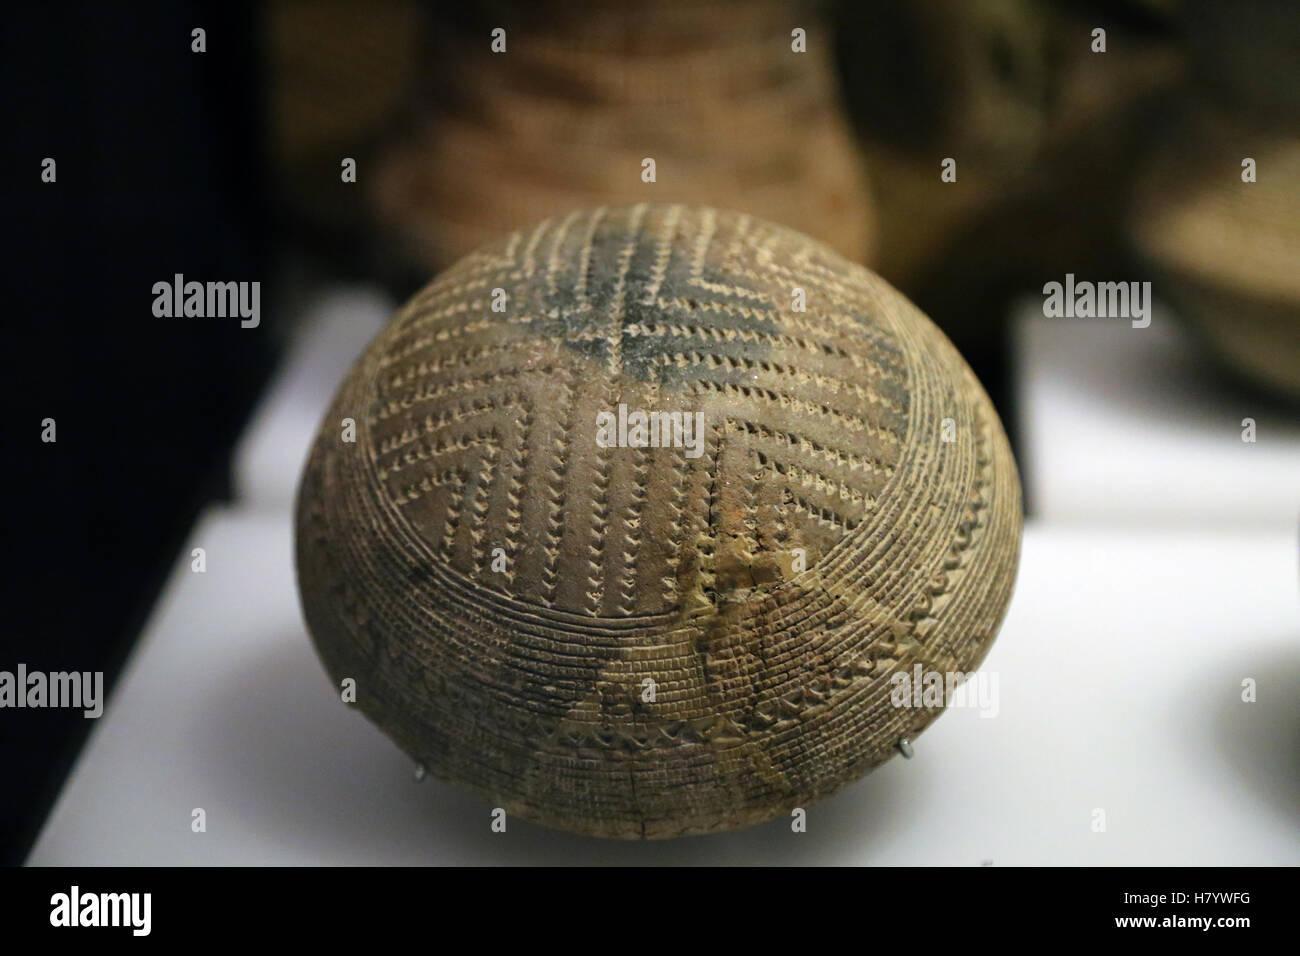 Becher-Kultur. Verzierte Schüssel.  Frühe Bronzezeit. Algodor (Aranjuez, Madrid). Nationales Archäologisches Stockbild